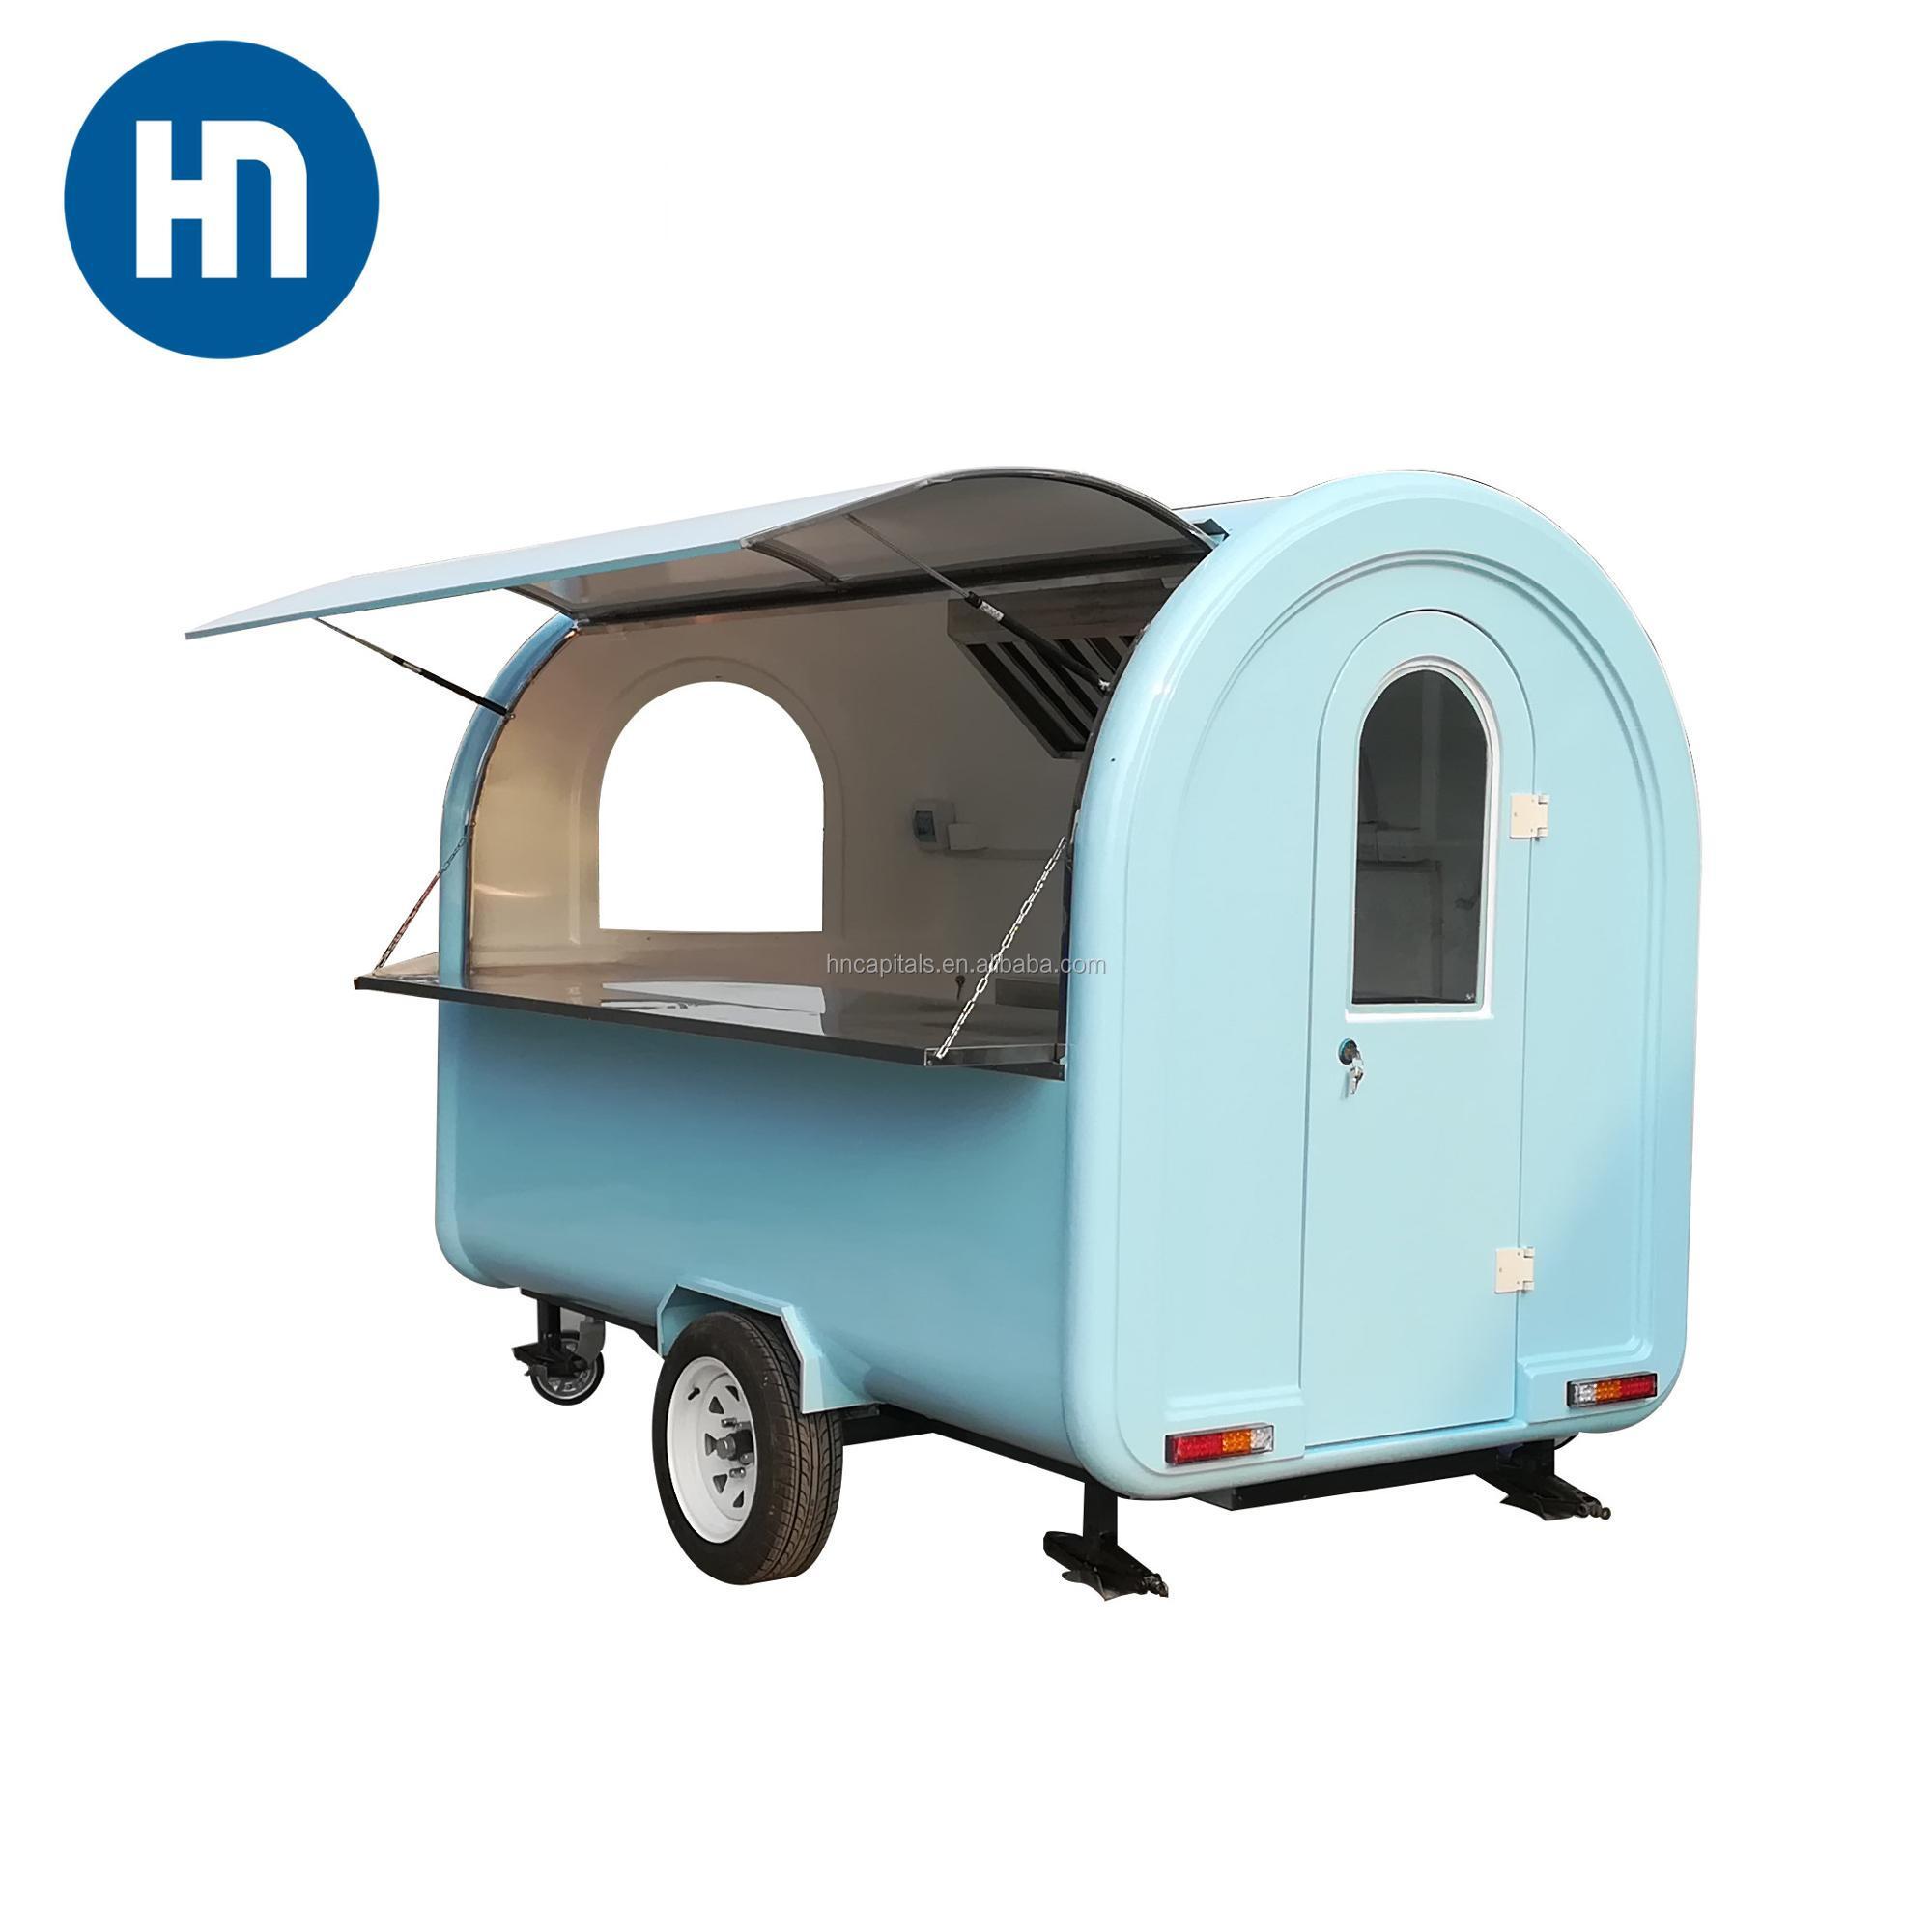 Mini Mobile Kitchen, Mini Mobile Kitchen Suppliers and Manufacturers ...